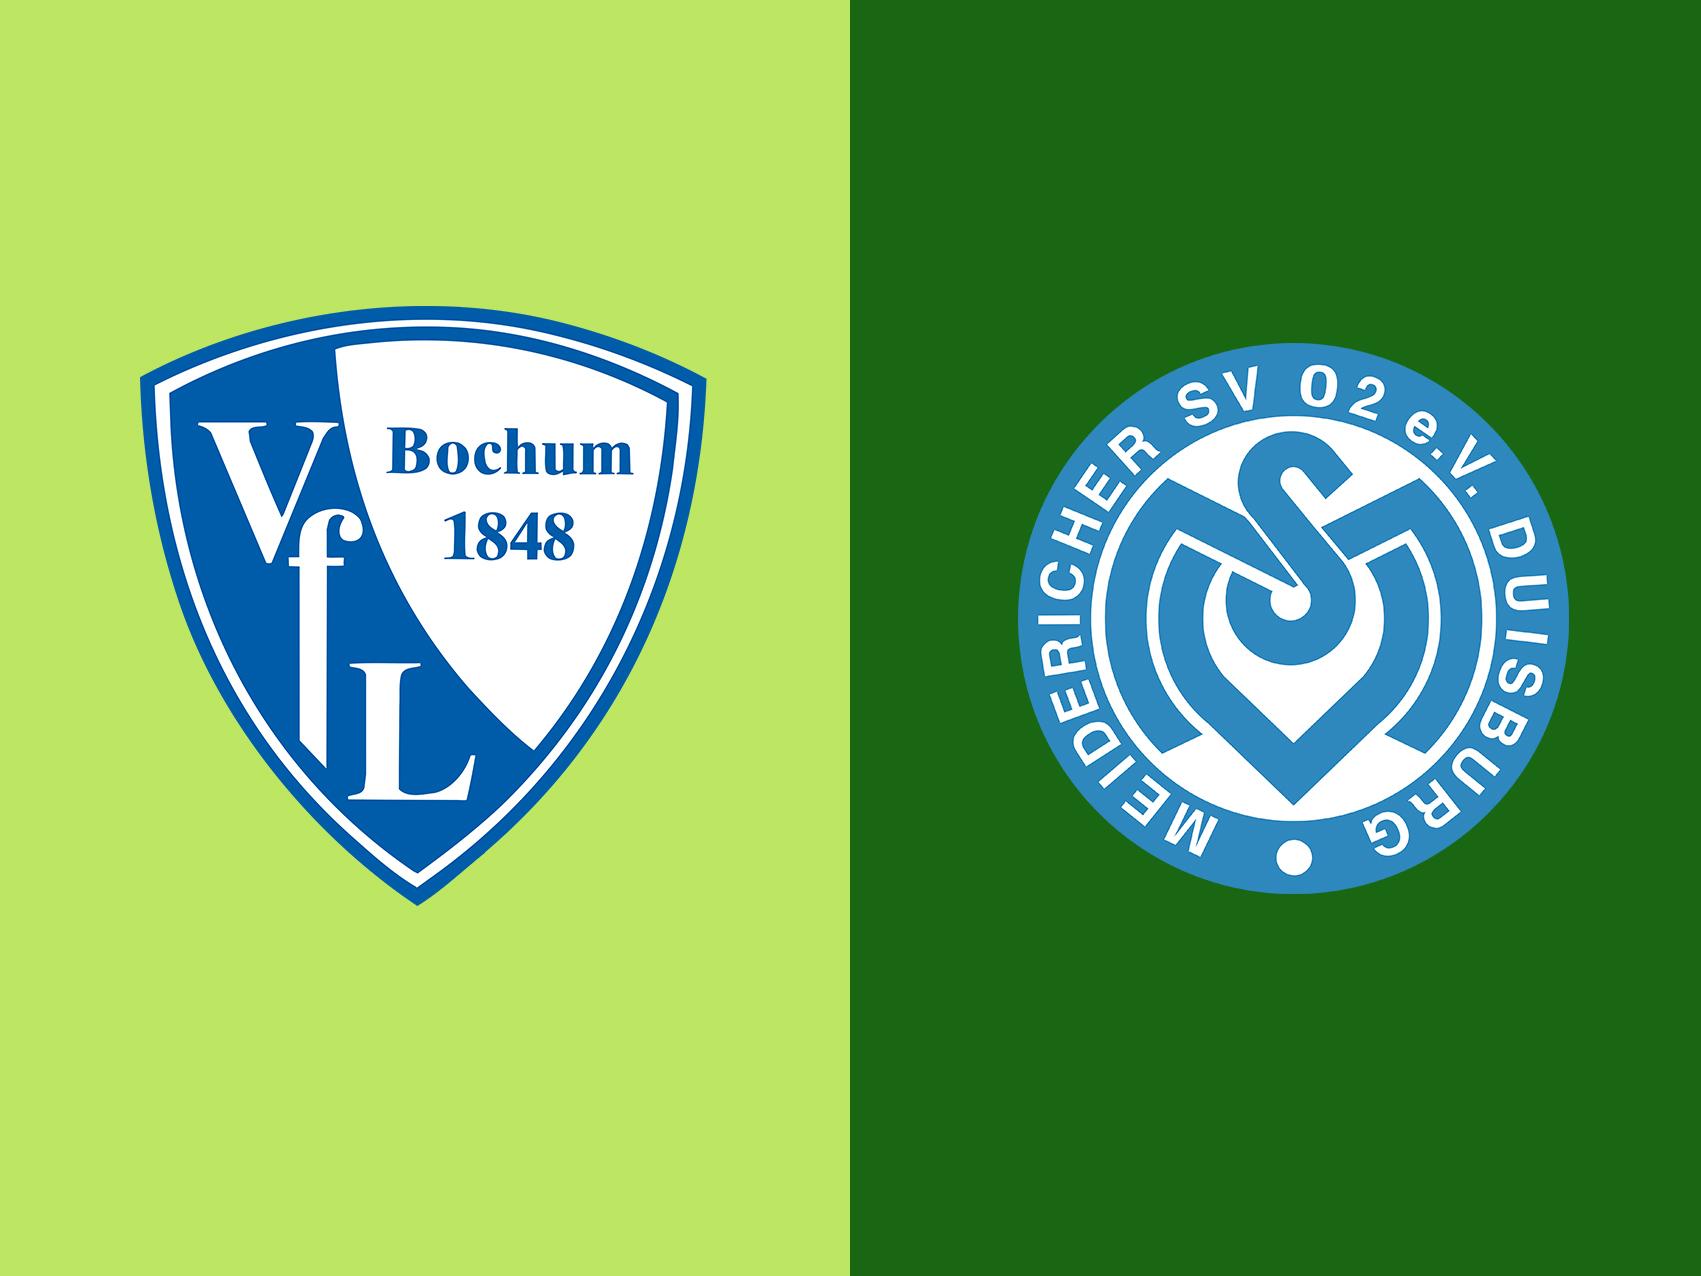 bochum-vs-duisburg-–-tip-bong-da-30-1-2019 1